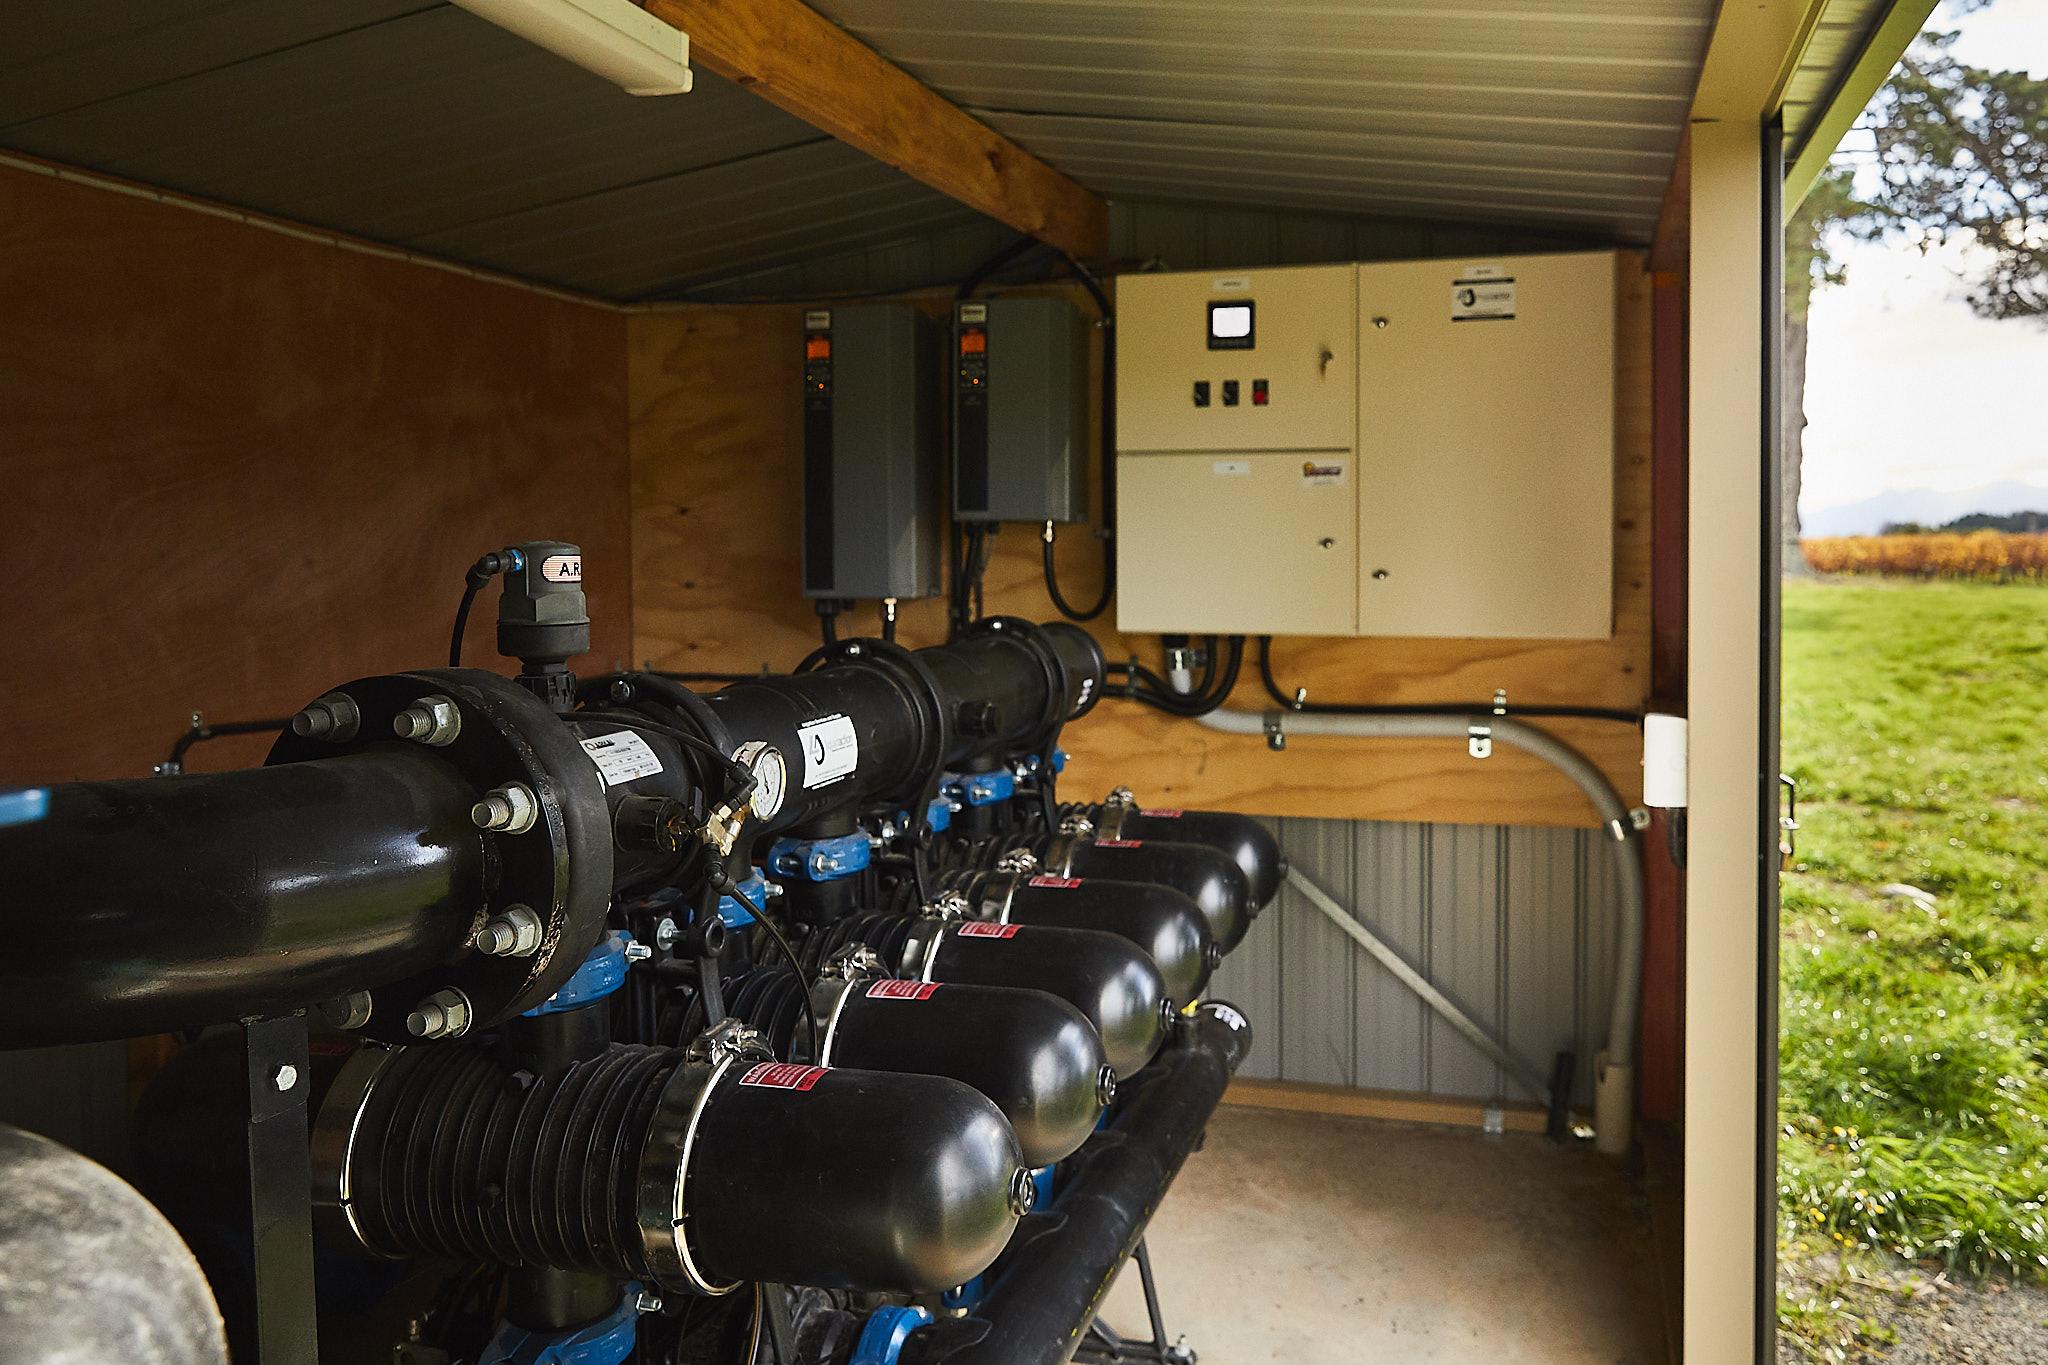 Pumps & Filtration - • Commercial & Domestic Pumps• Irrigation Pumps• Effluent Pumps• Commercial & domestic filtration